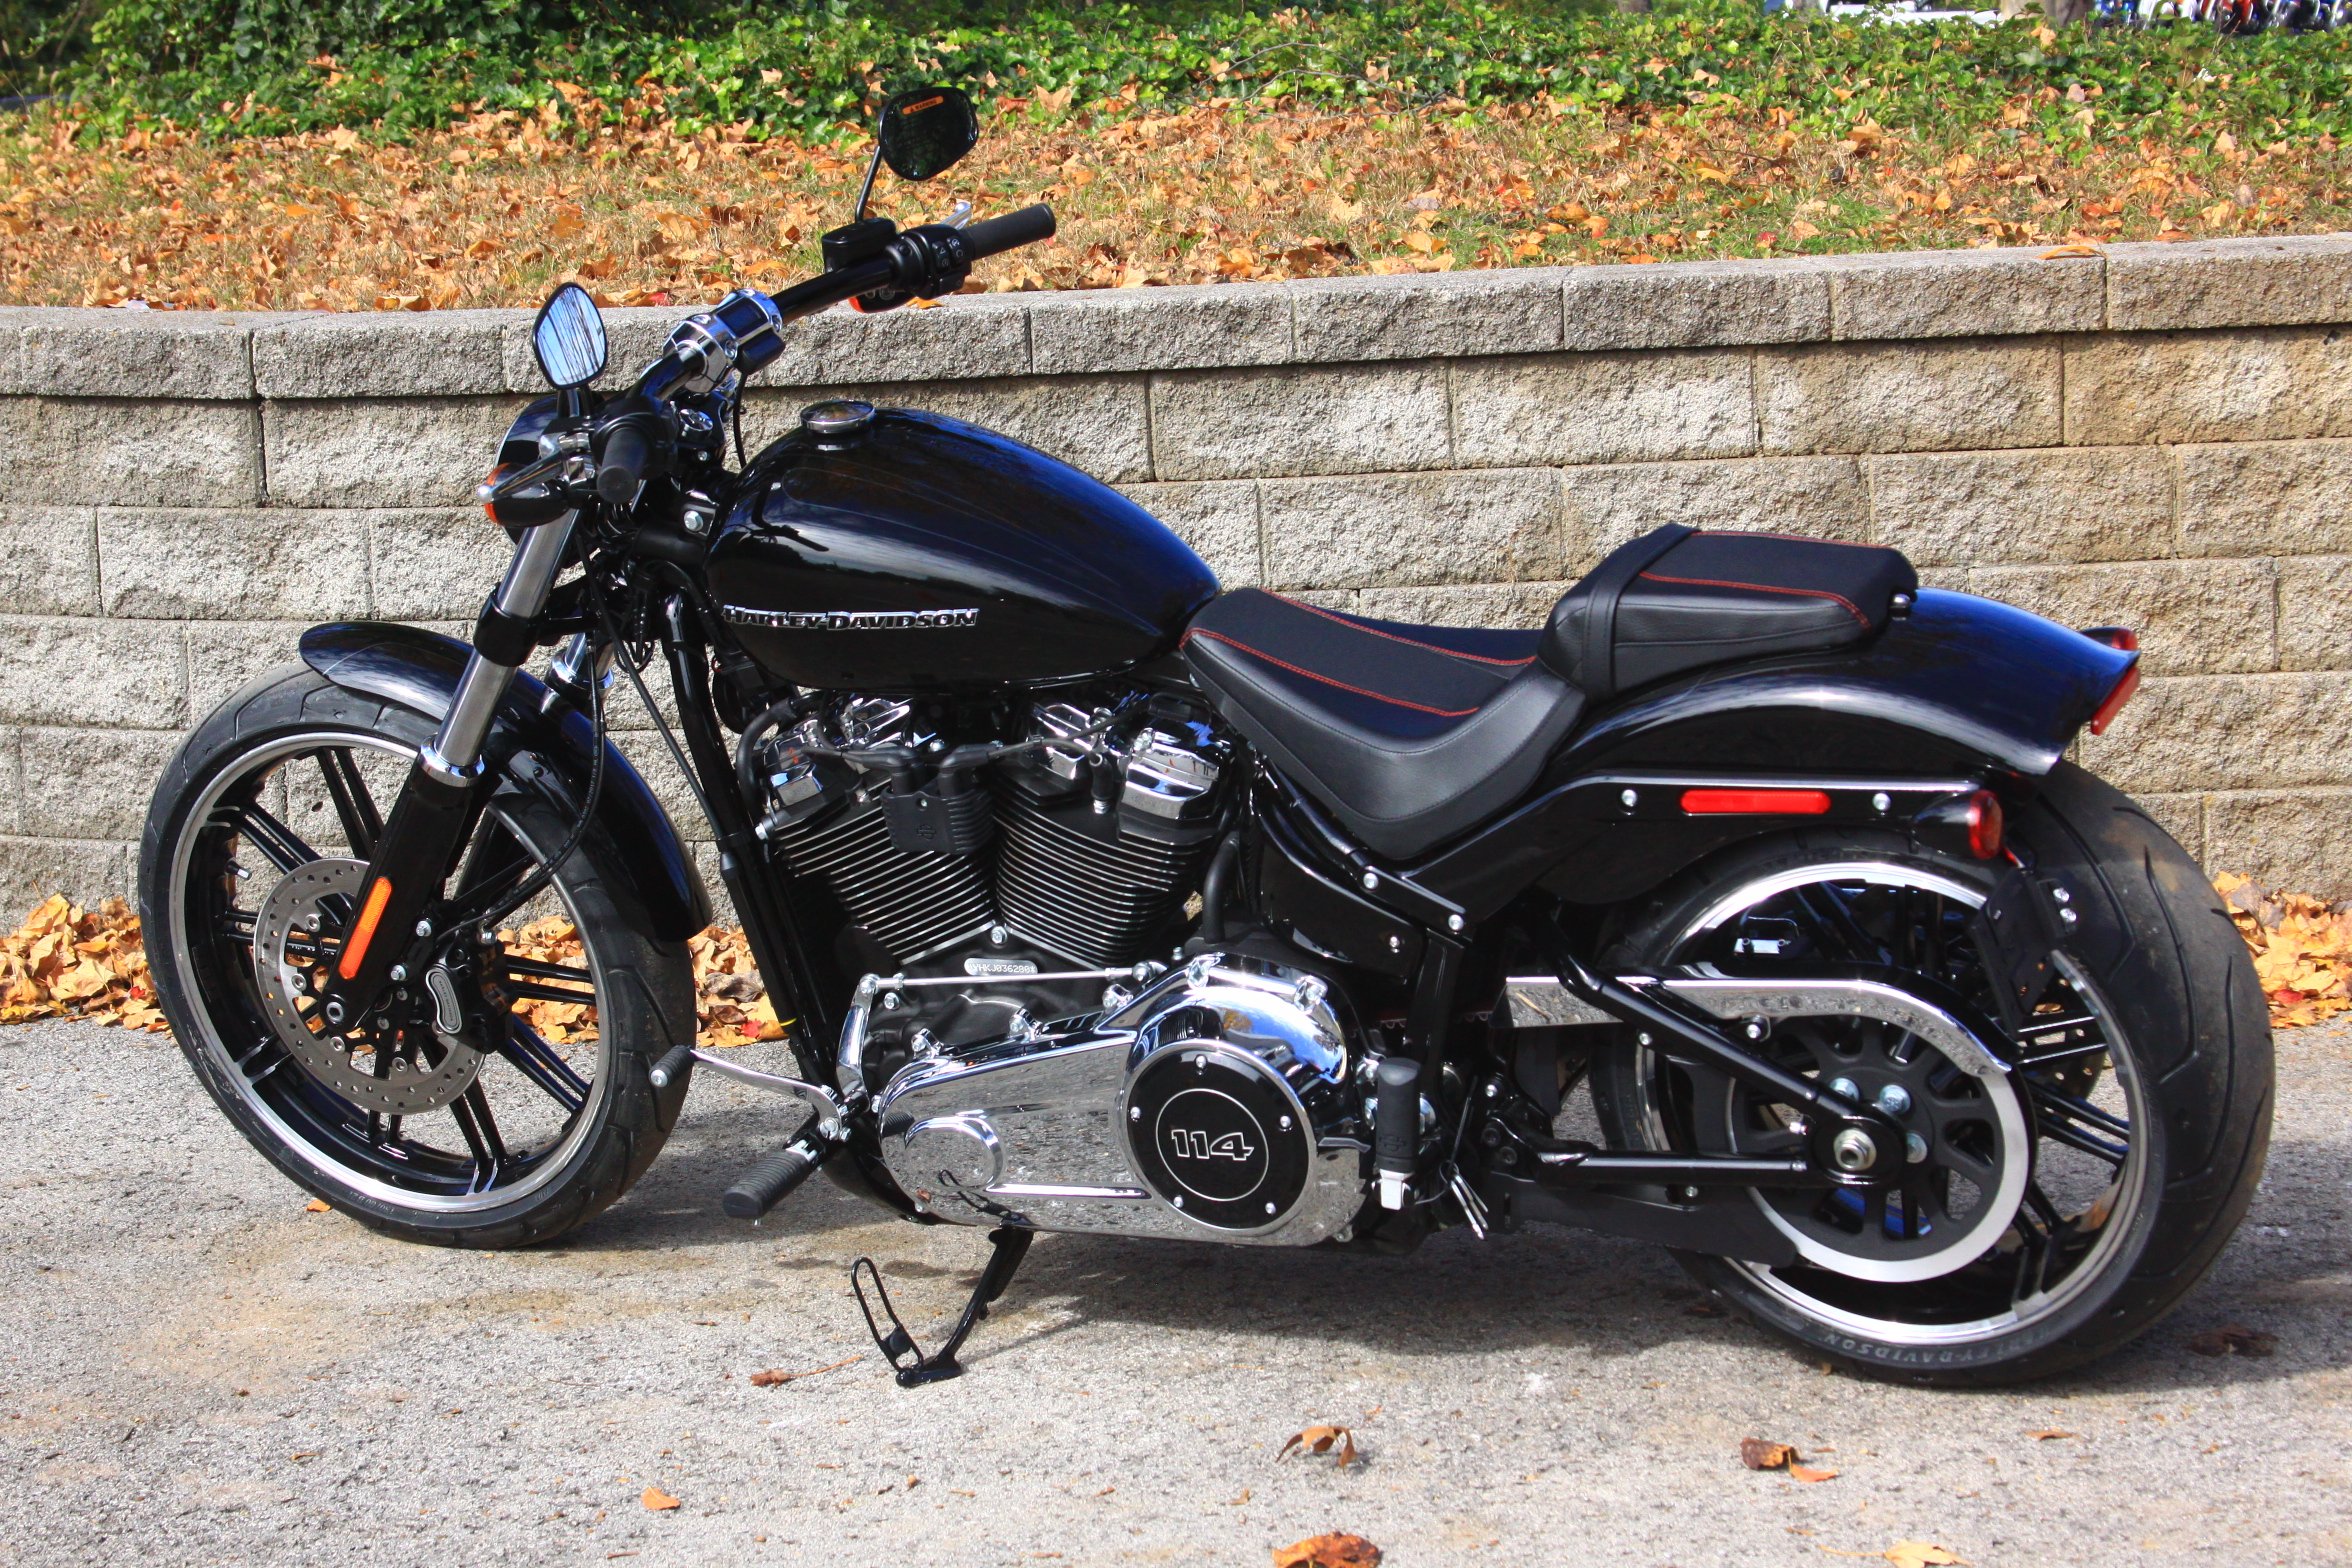 New 2019 Harley-Davidson Breakout in Franklin #T047246 ...